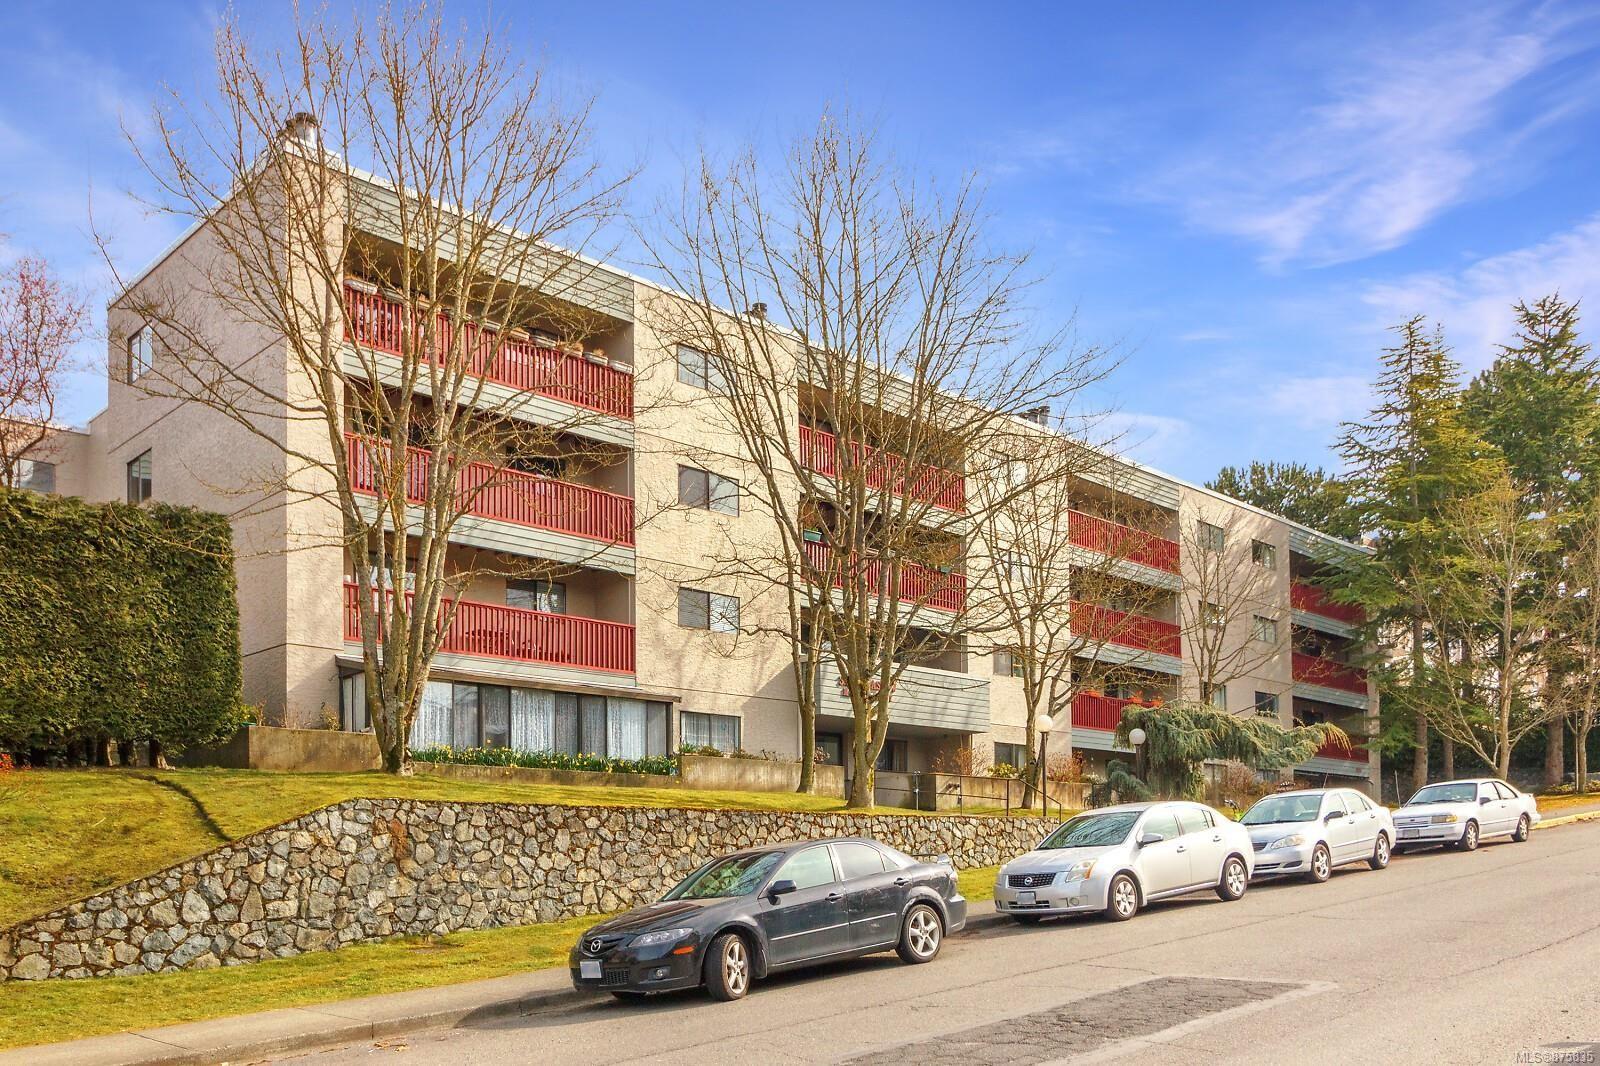 Main Photo: 302 3255 Glasgow Ave in : SE Quadra Condo for sale (Saanich East)  : MLS®# 875835